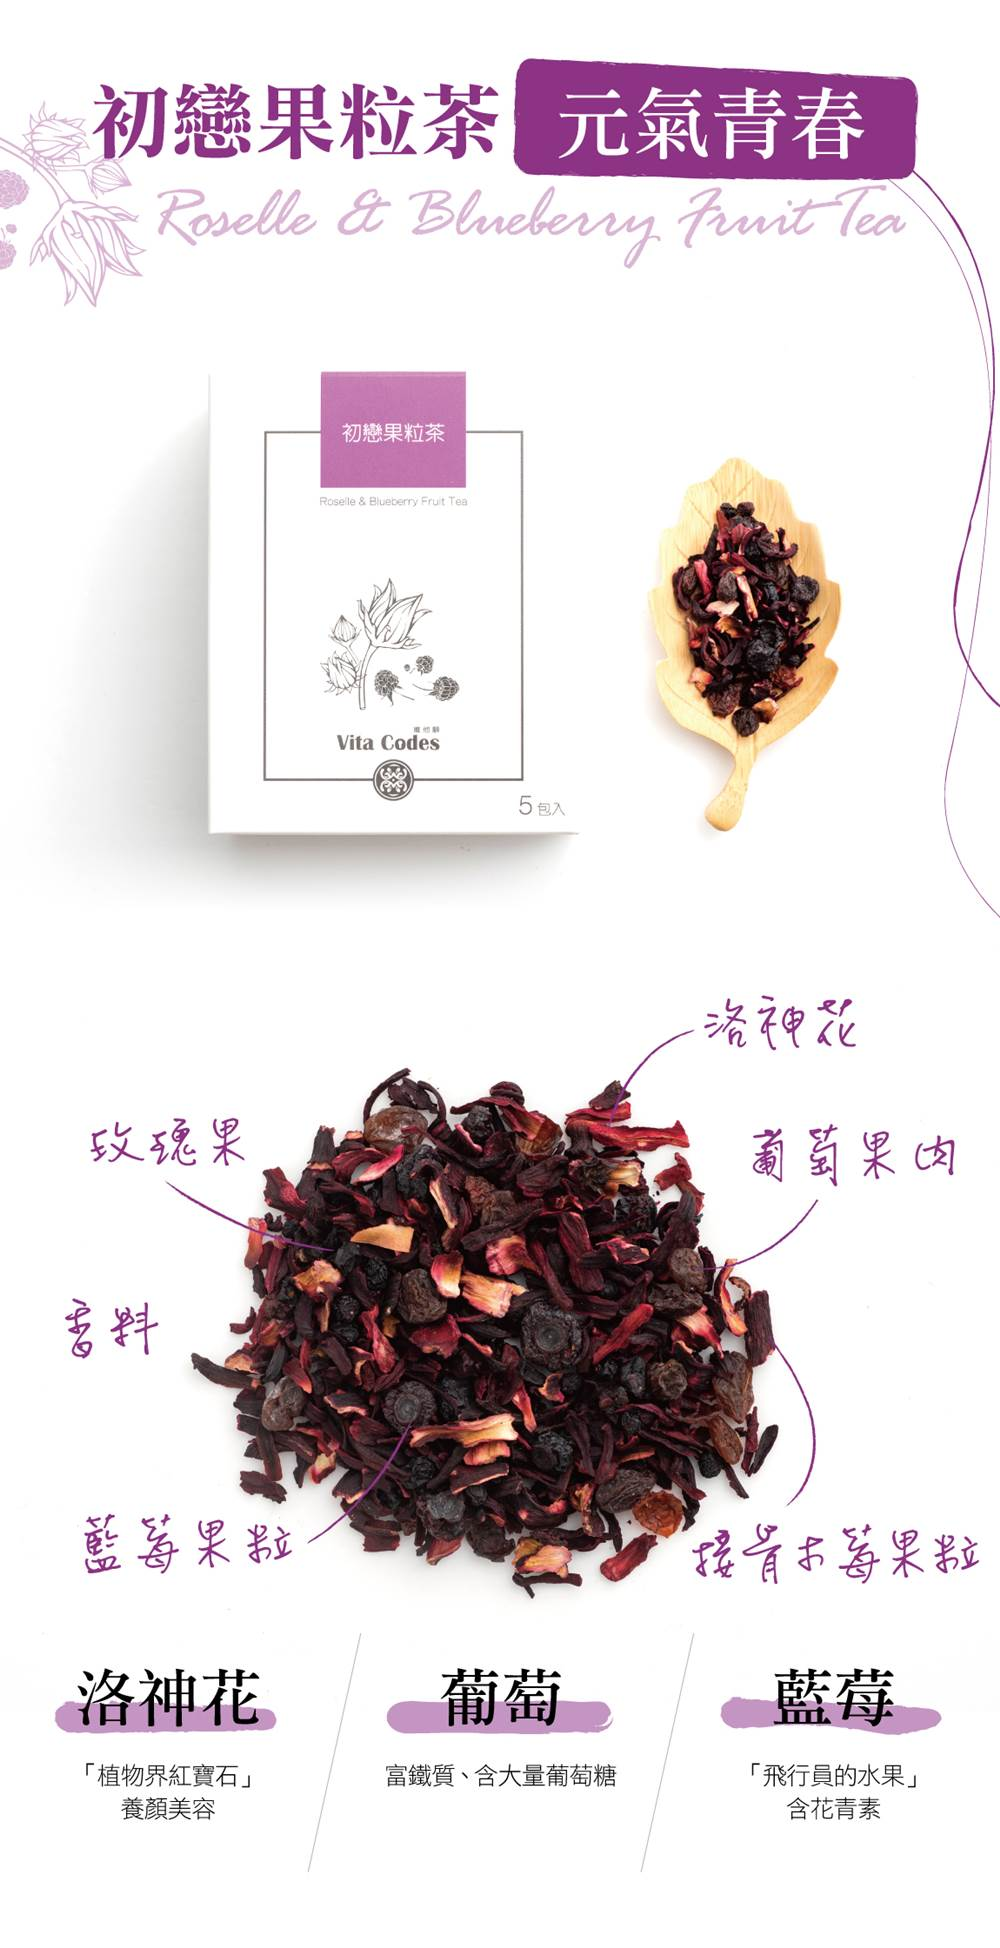 VitaCodes美顏茶-產品介紹05-初戀果粒茶-元氣抗氧